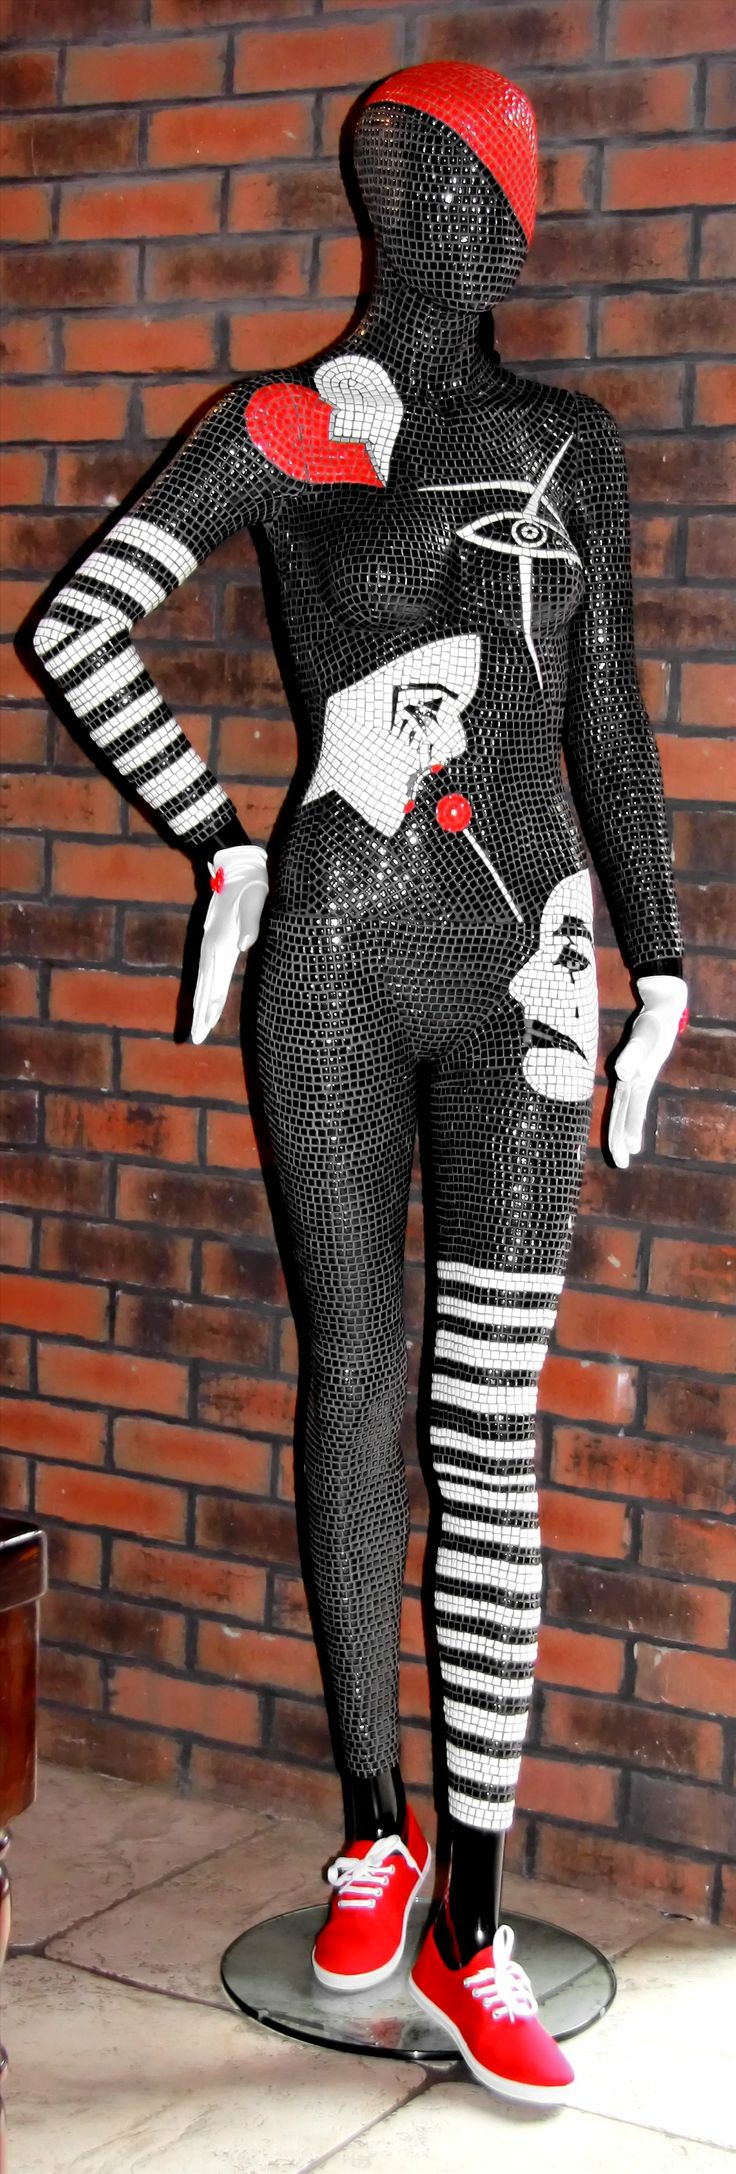 200 best mosaic art on mannequins images on pinterest mosaic mosaicsart awesome luxury decorative mosaics art london mannequin dailygadgetfo Gallery